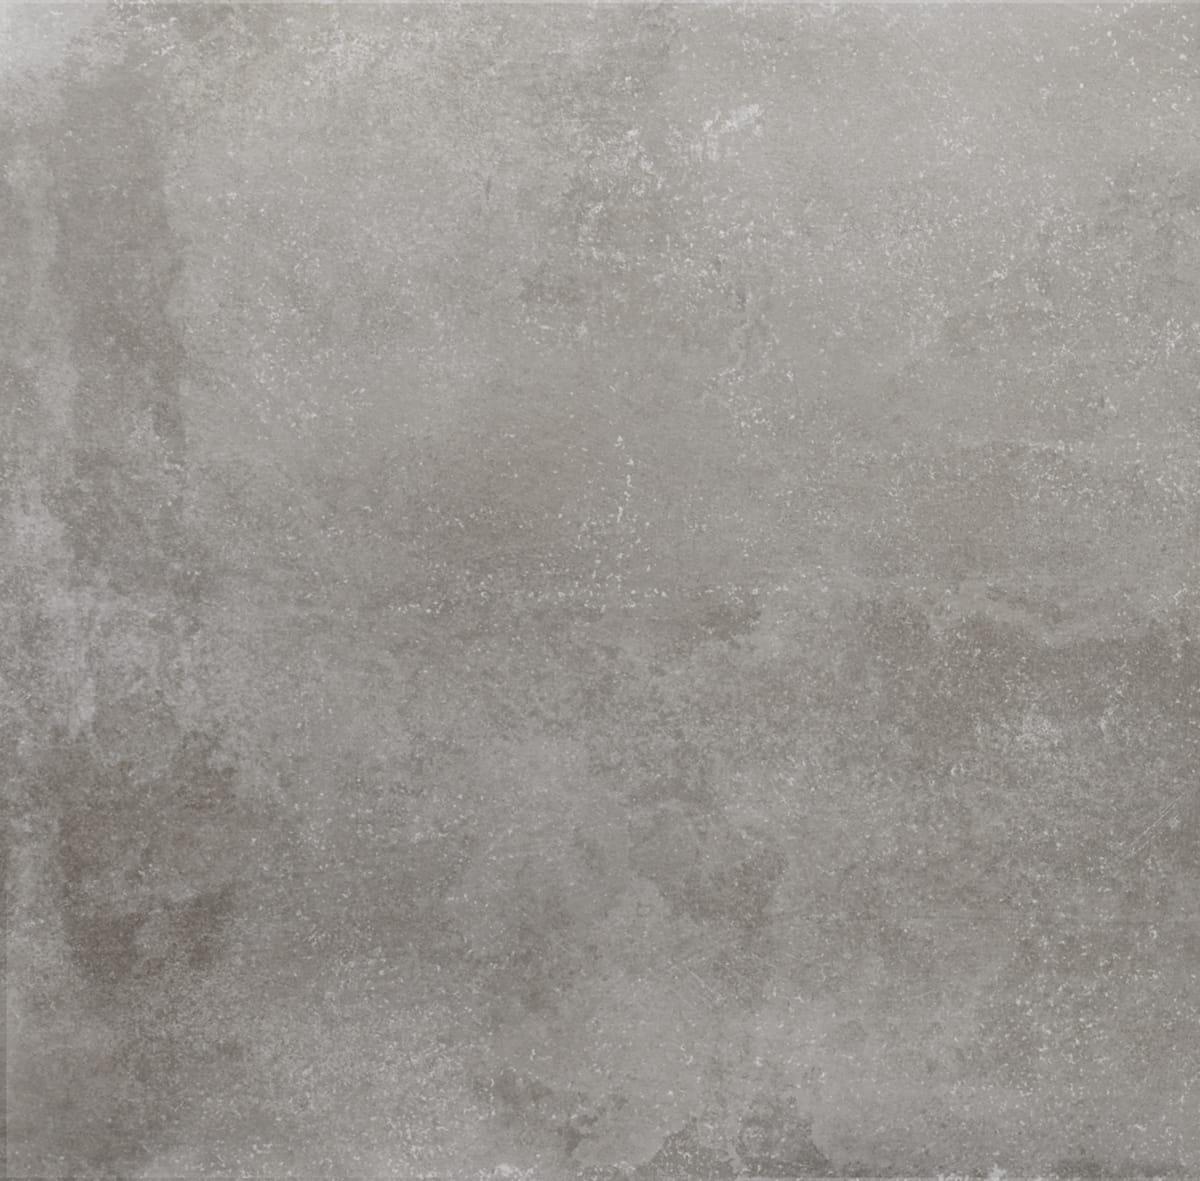 FOTO brooklin gris 59x59 ant